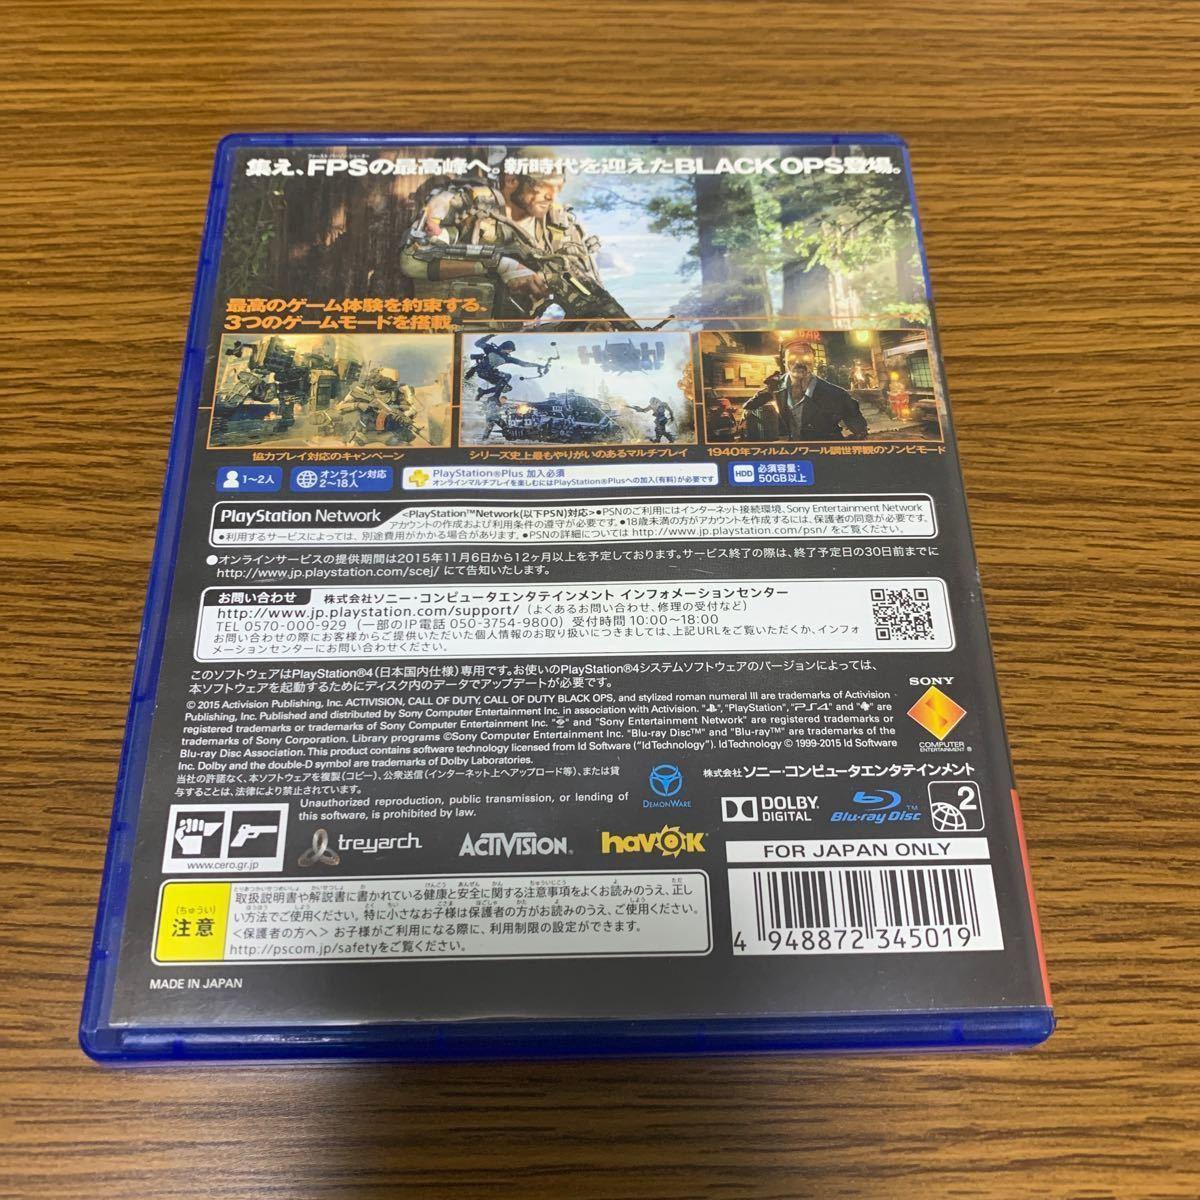 【PS4】 コール オブ デューティ ブラックオプスIII [通常版]CALL OF DUTY BLACK OPS3